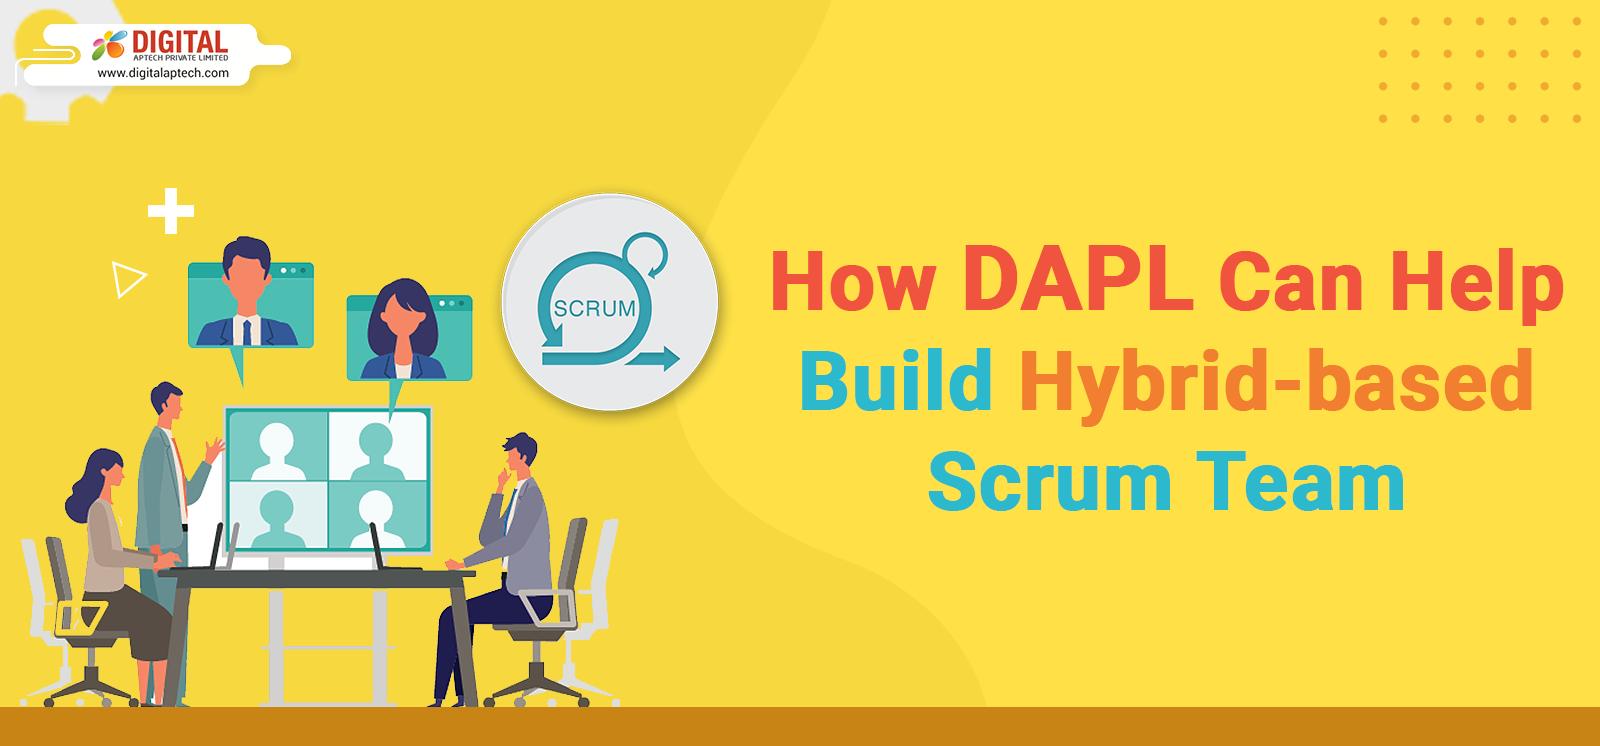 How DAPL Can Help Build Hybrid-based Scrum Team